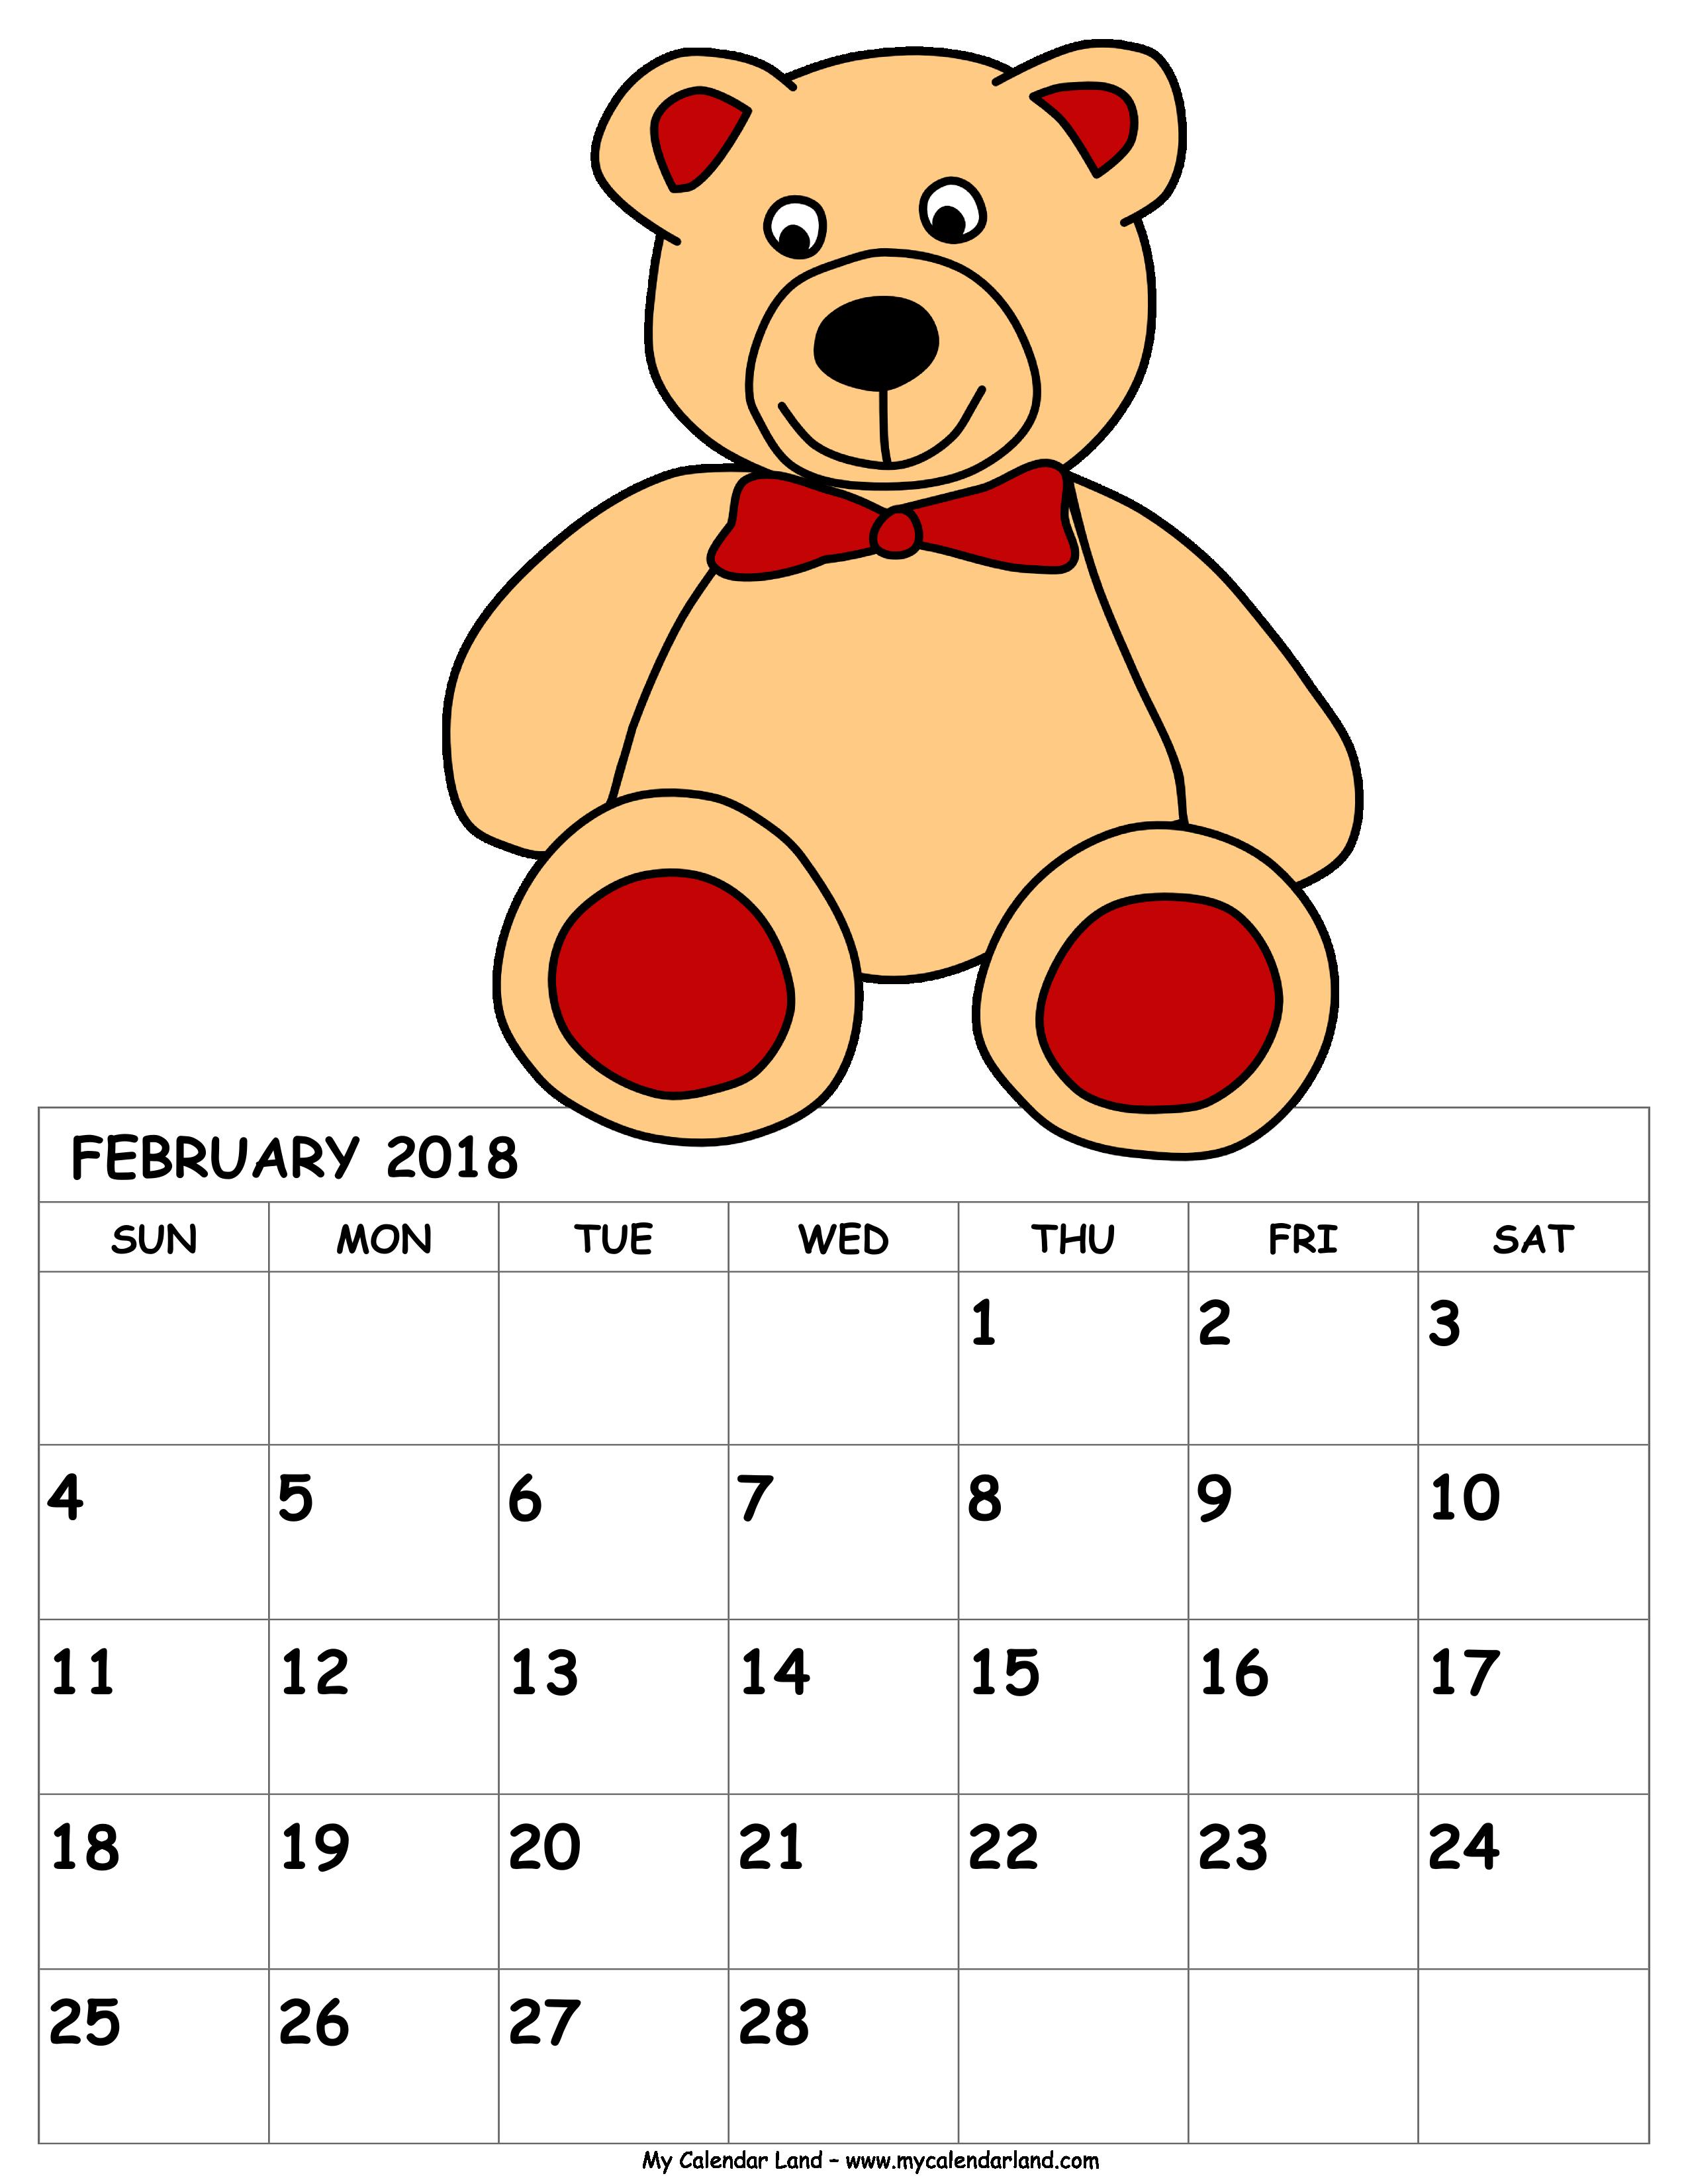 January 18th calendar clipart jpg black and white February 2018 Calendar - My Calendar Land jpg black and white